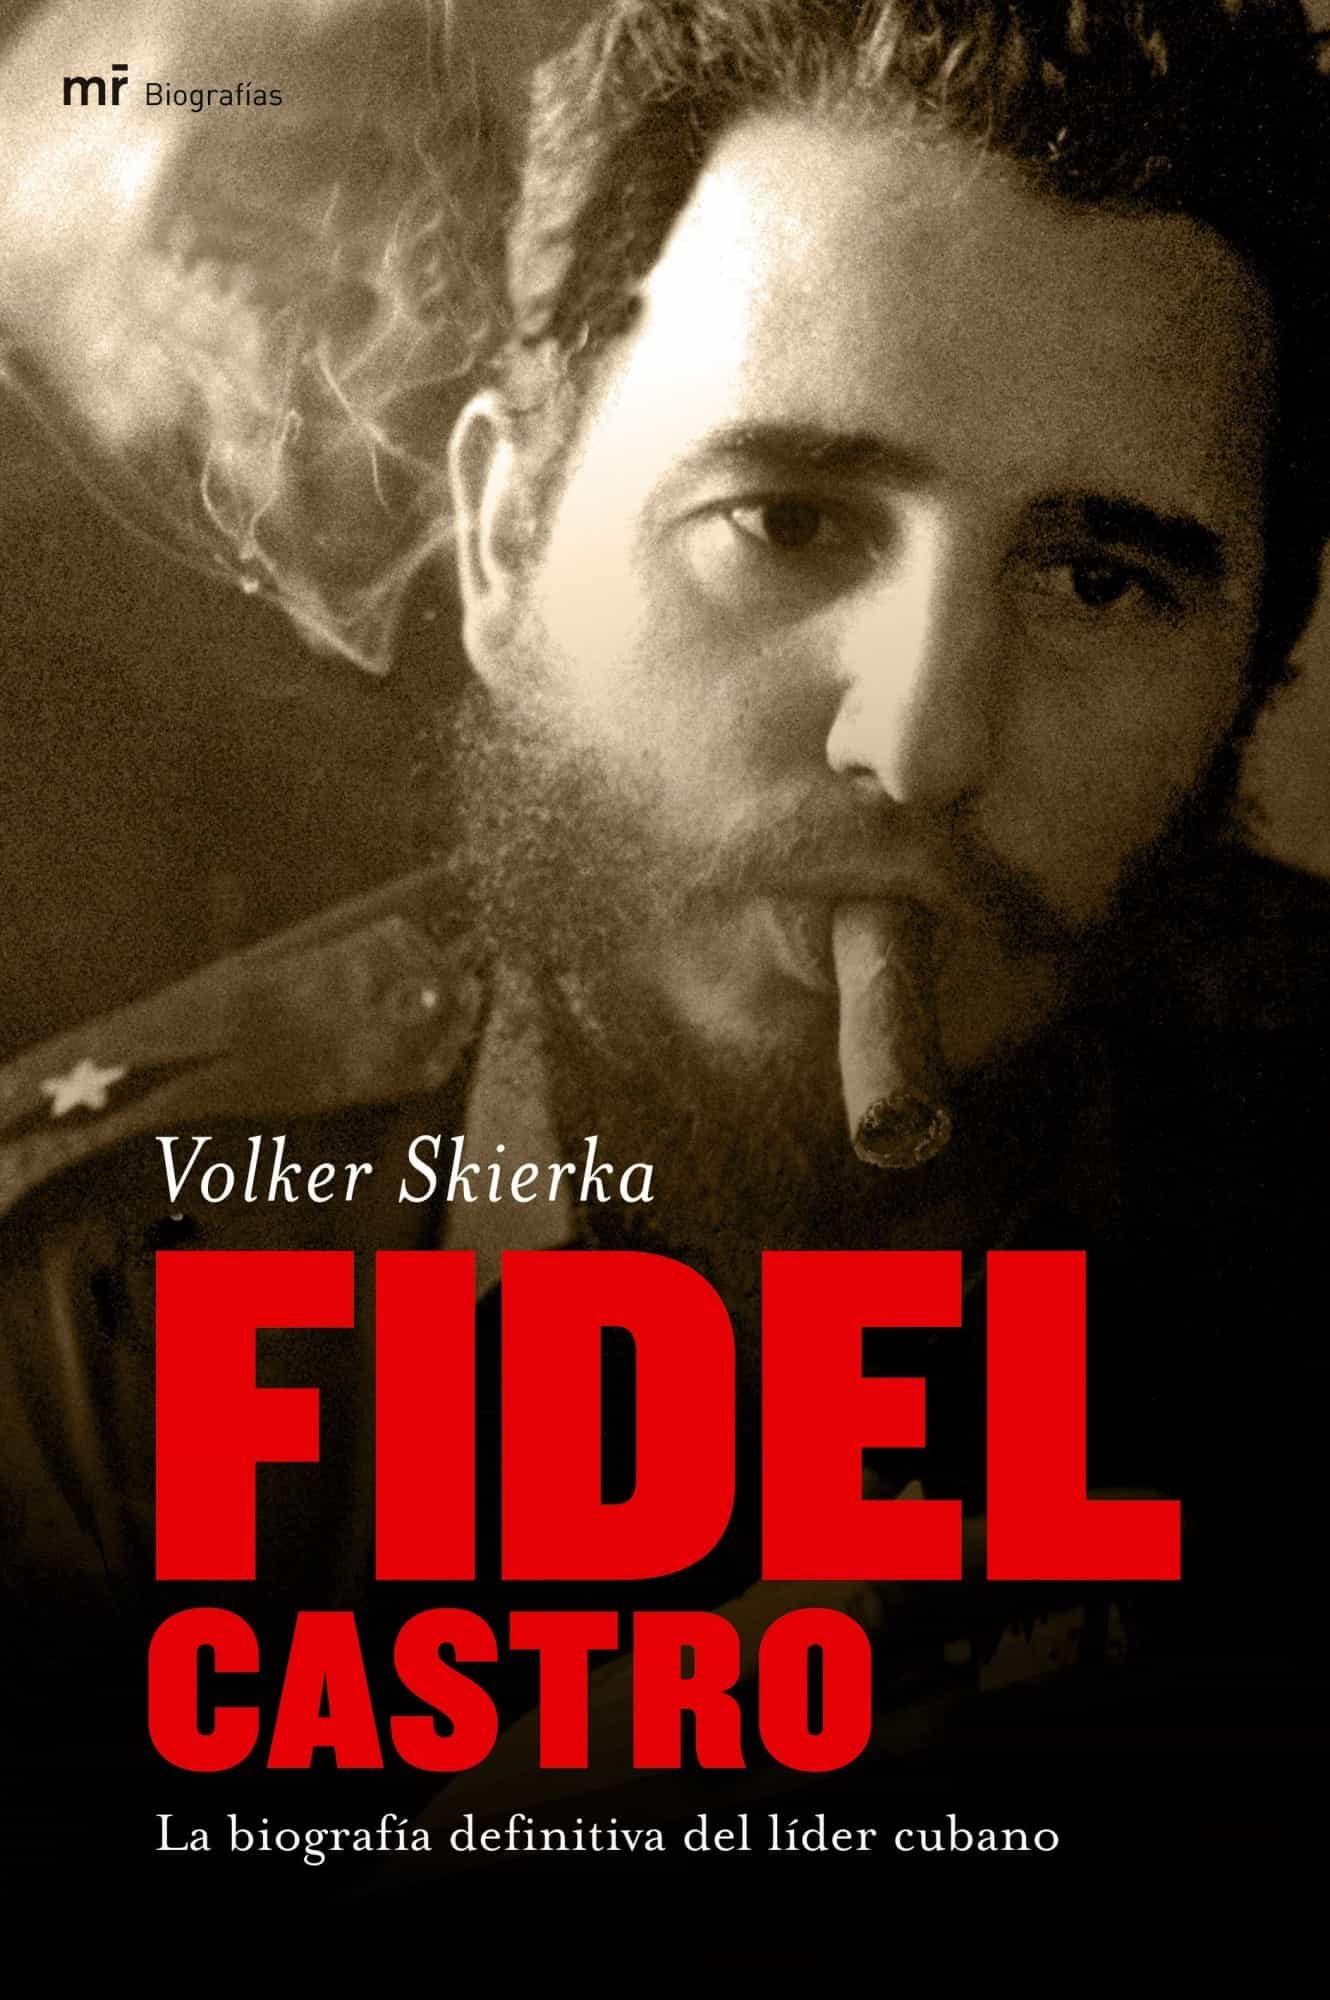 Fidel Castro: La Biografia Definitiva Del Lider Cubano por Volker Skierka